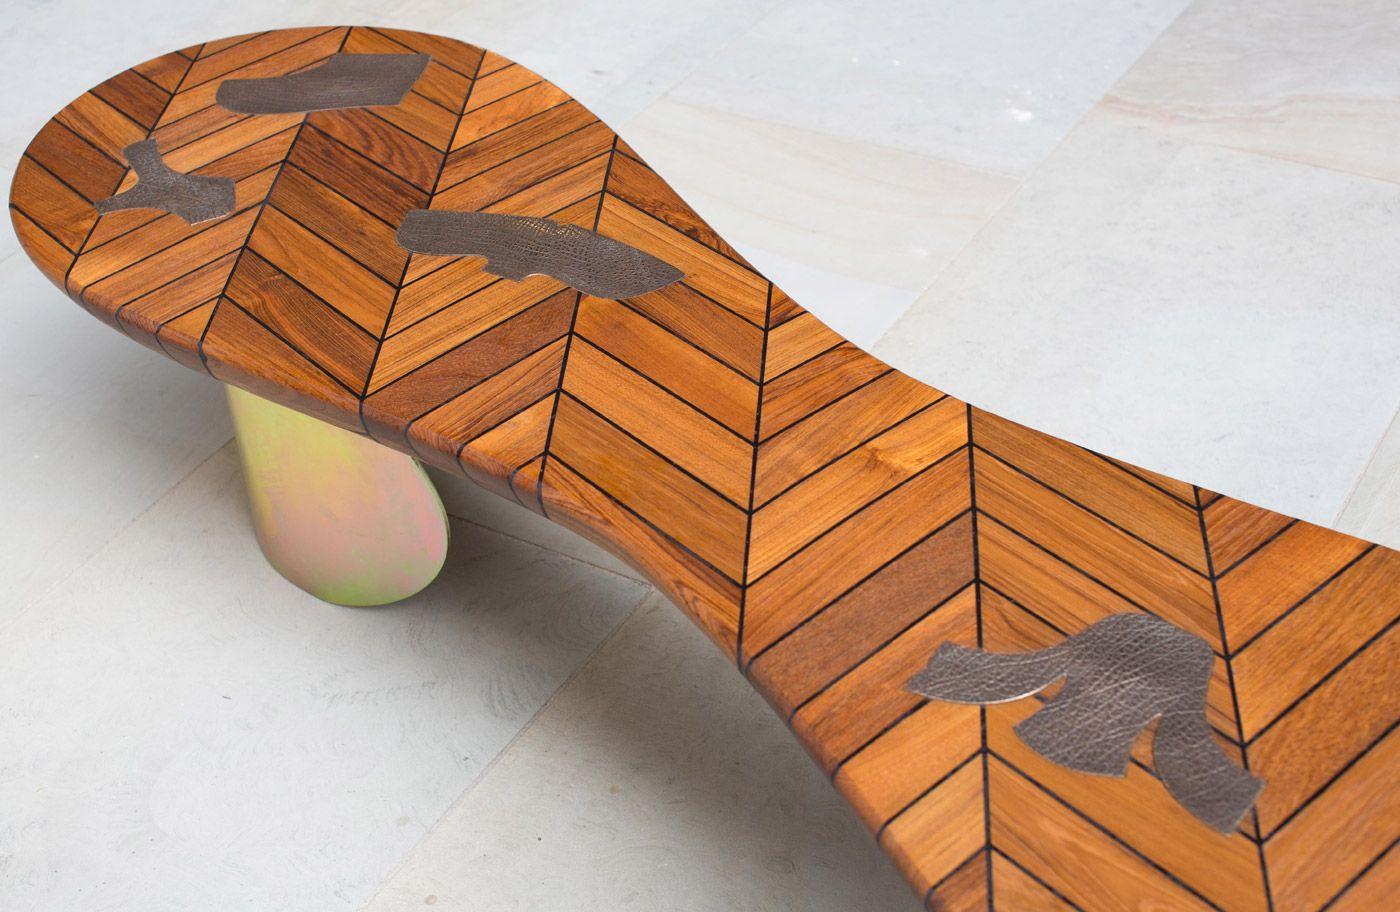 Juriaan Booij's Studio Swine Film Celebrates London Craftsmanship and Artwork